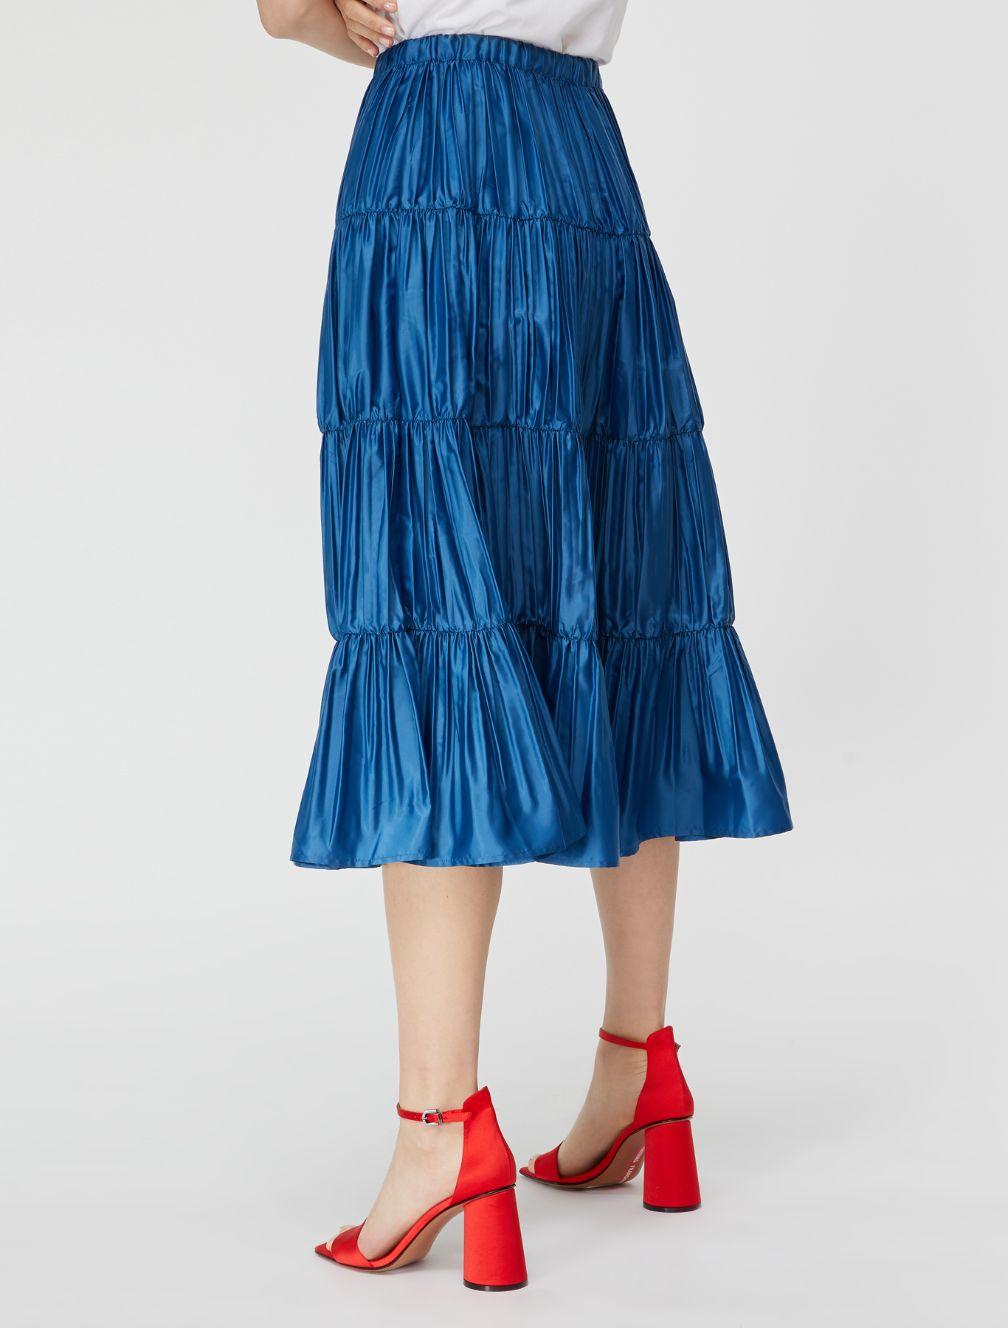 DATABILE Skirt china clue 2